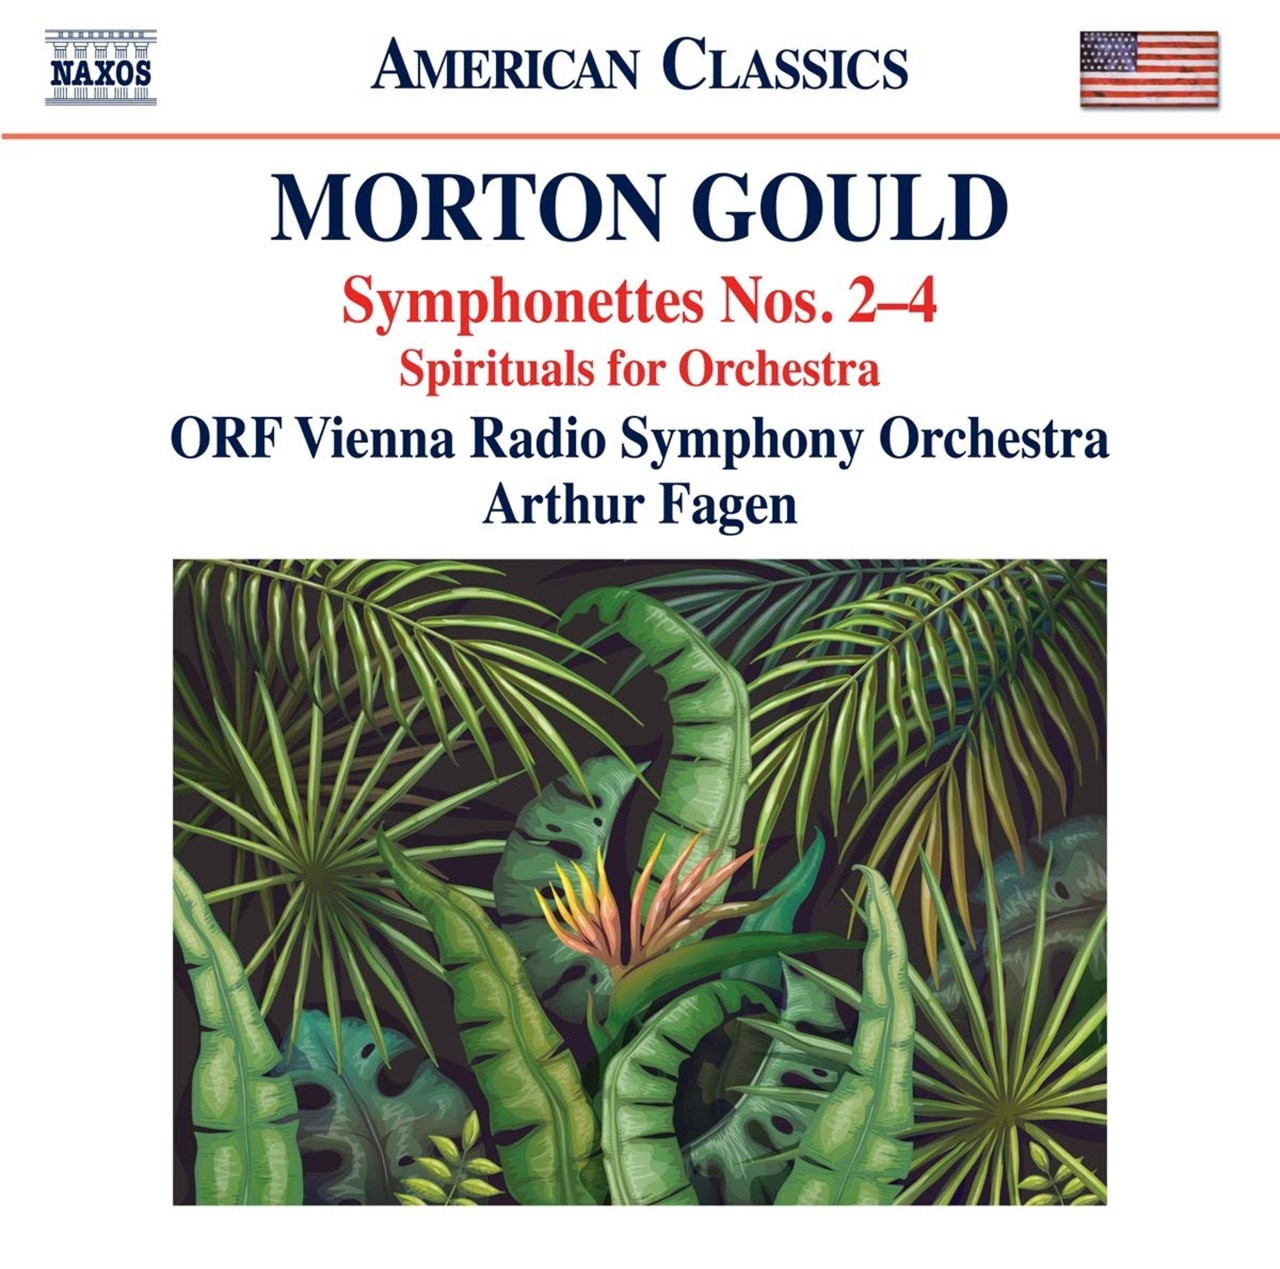 Morton Gould: Symphonies Nos. 2-4 - 1